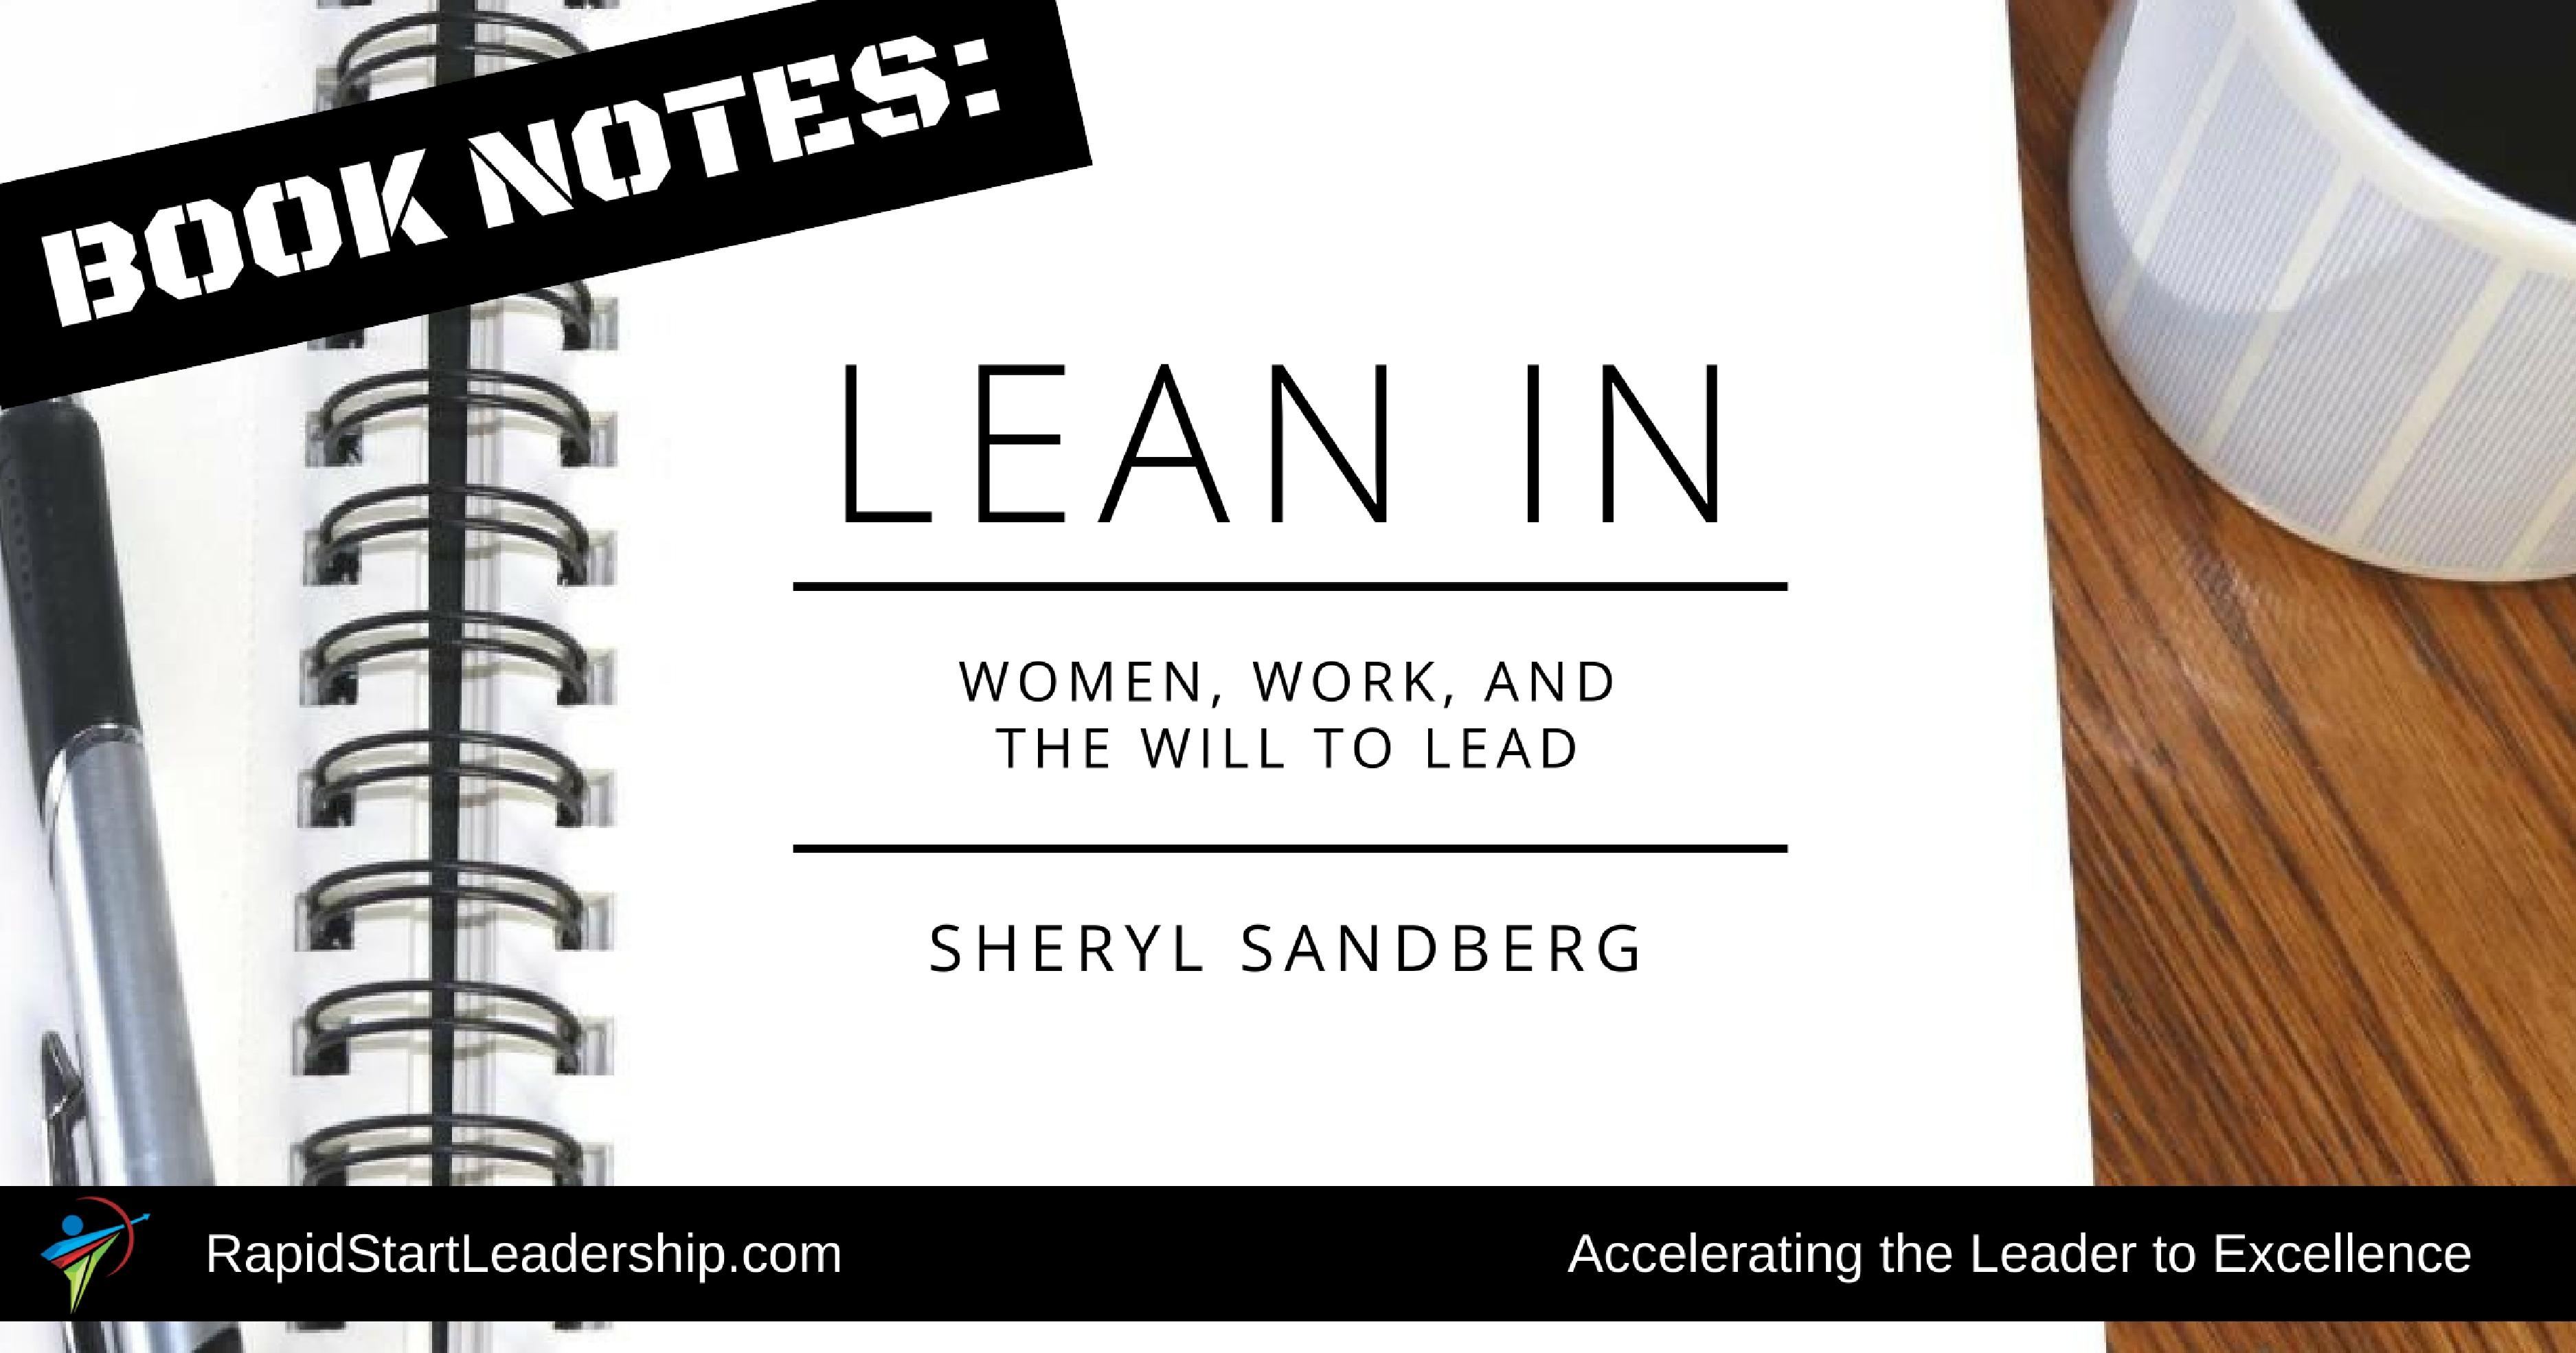 Book Notes: Lean In - RapidStart Leadership